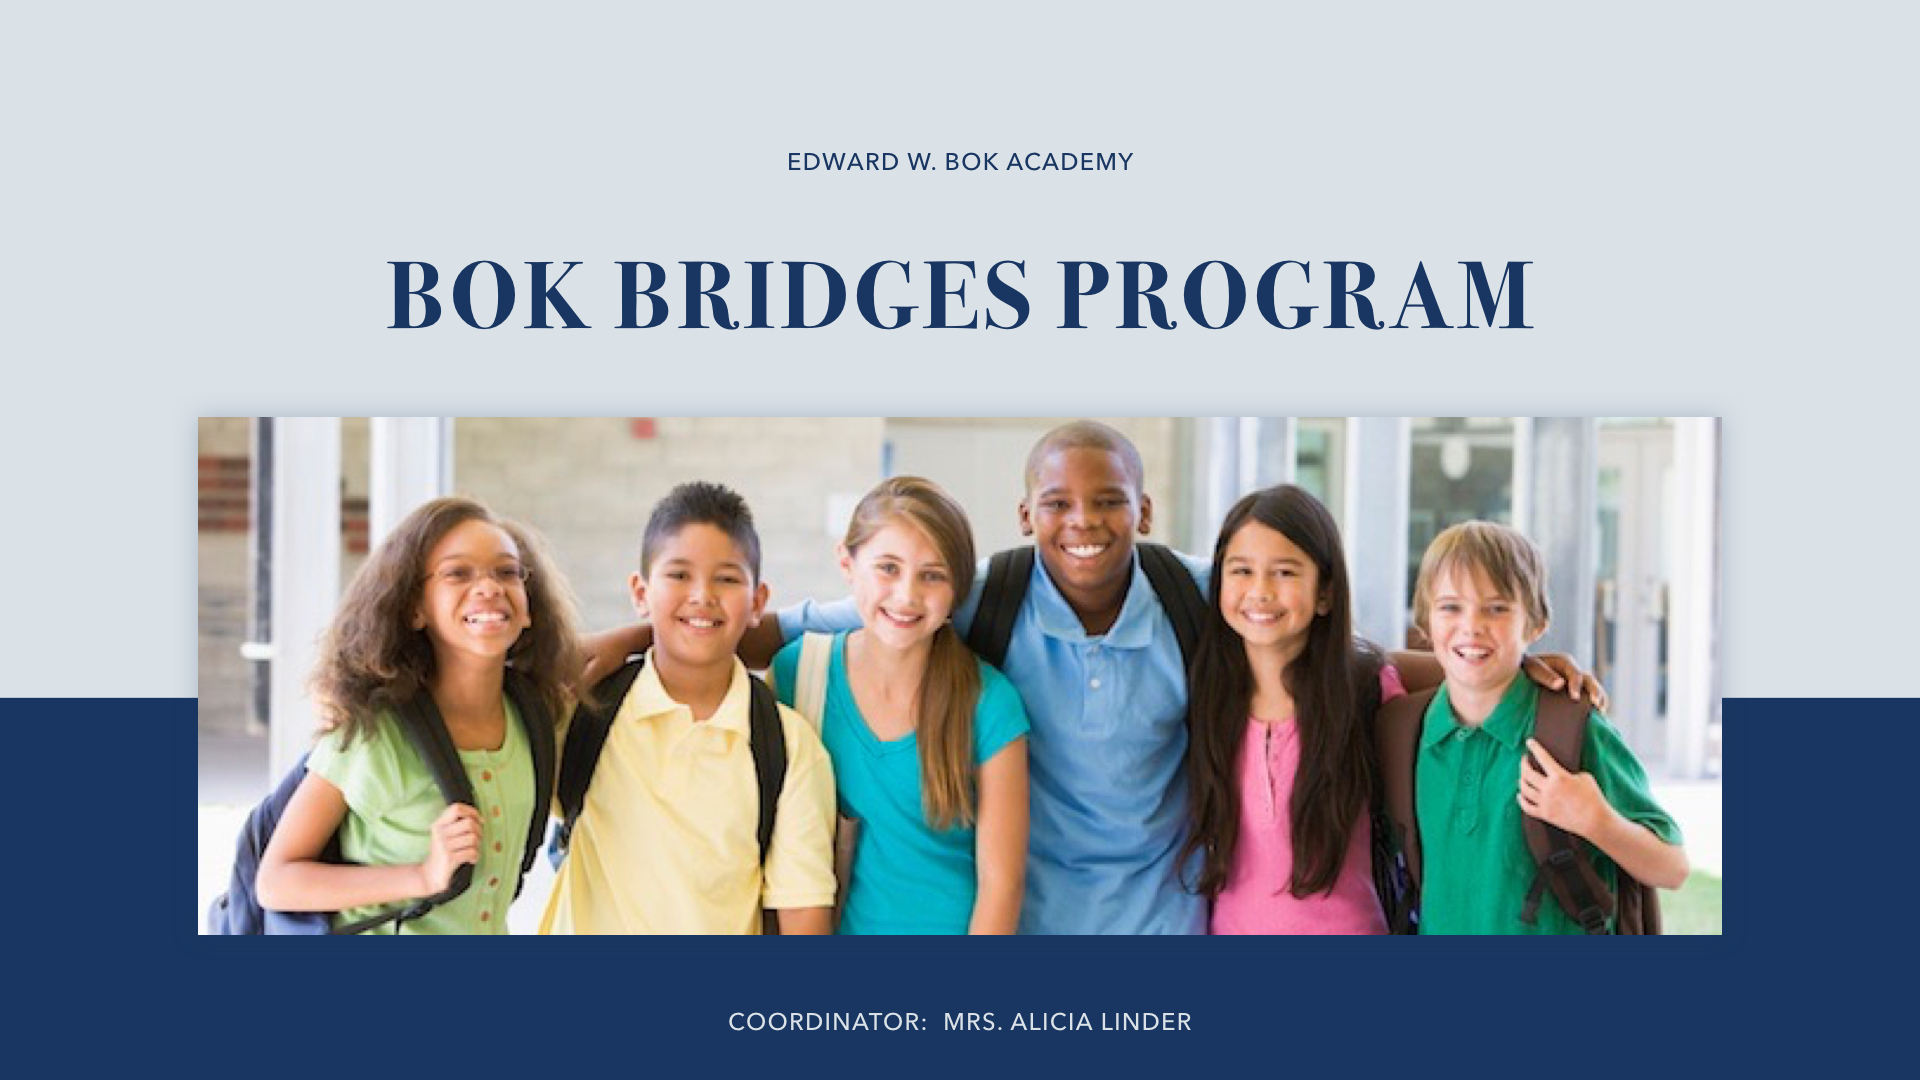 Bok Bridges